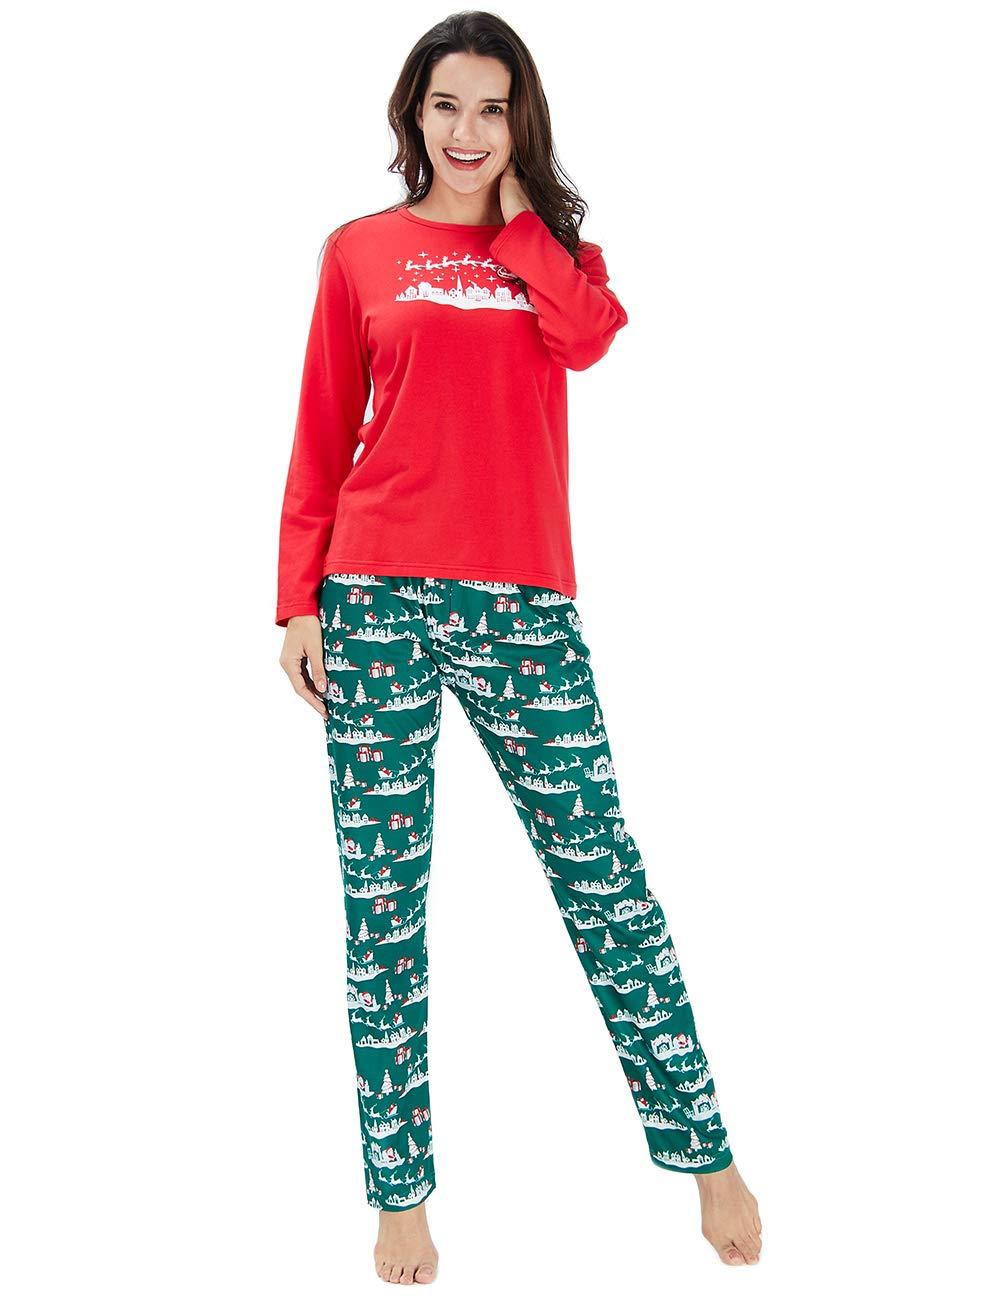 Chicolife Familia árbol de Navidad Set Manga Larga Pijamas Ropa de Noche Pantalones Superior Establece para mamá